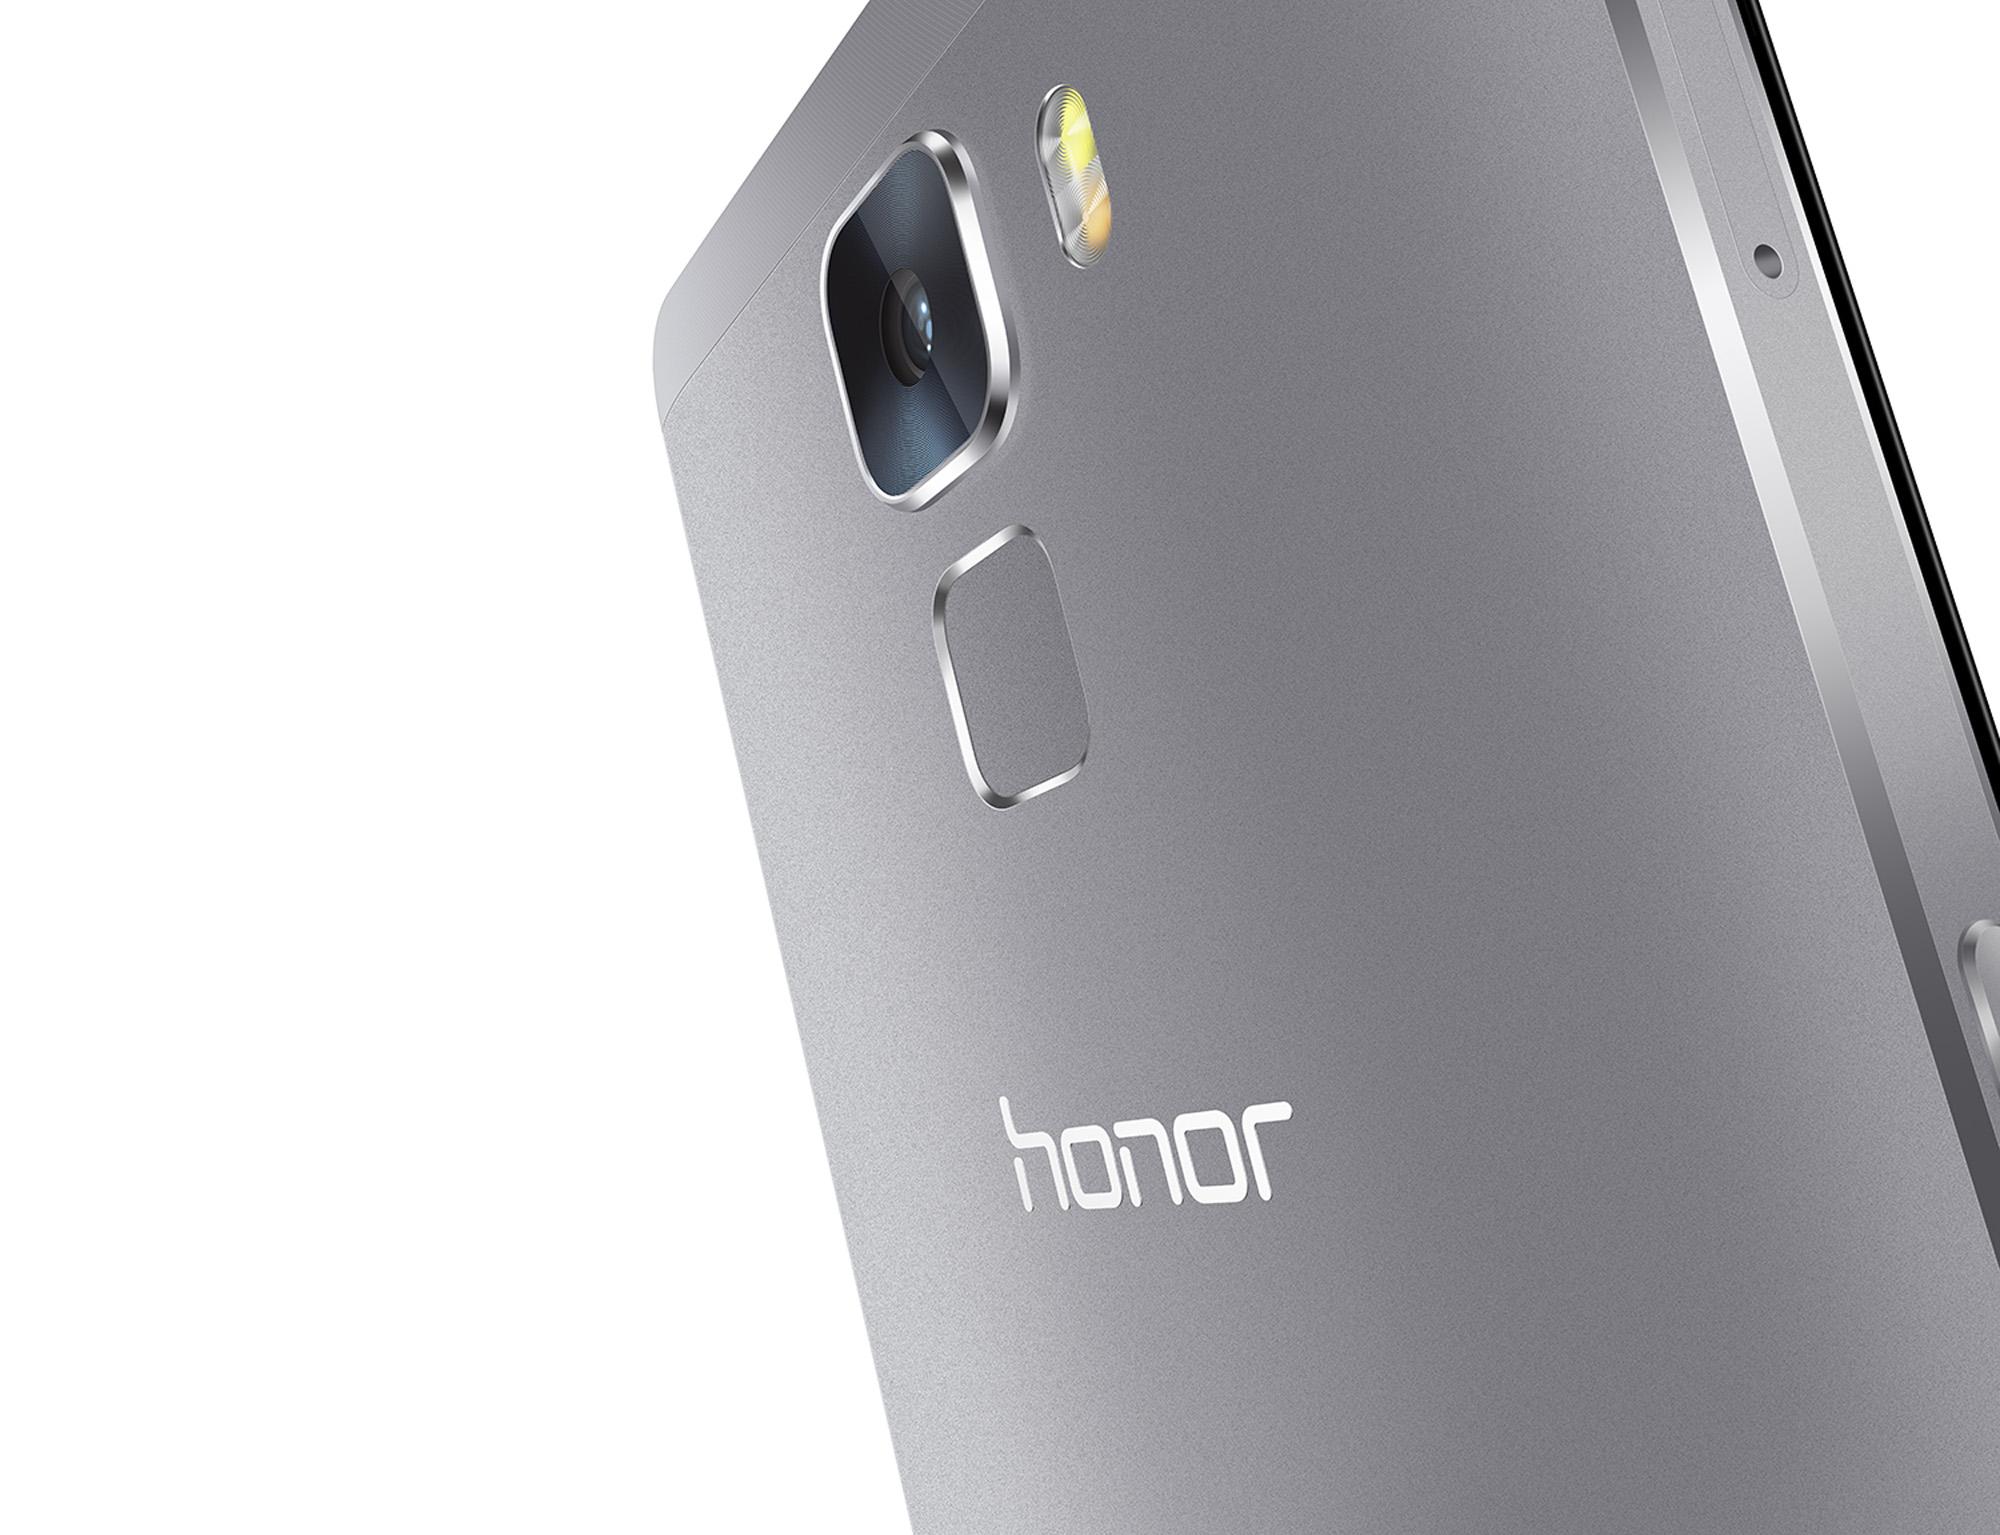 honor_7_back_close